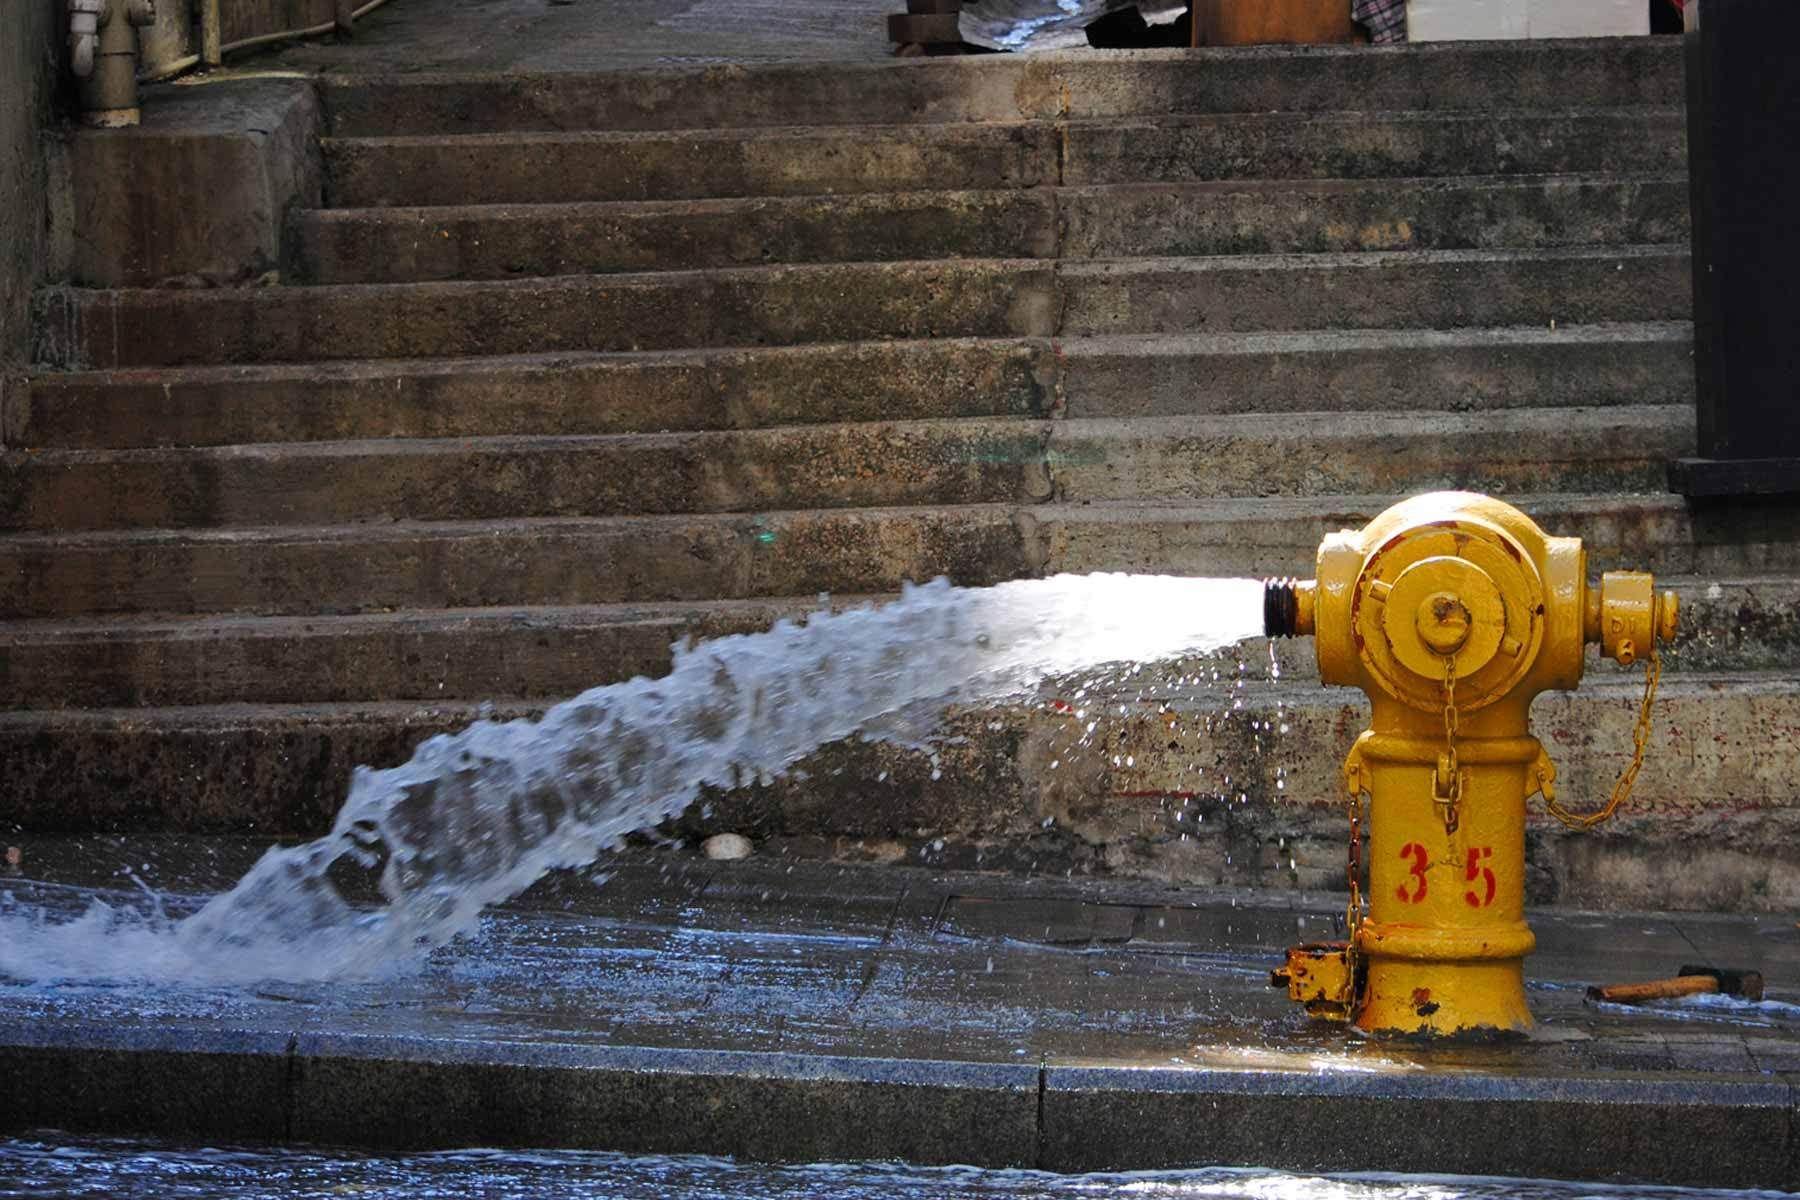 100___hk___fire_hydrant.jpg